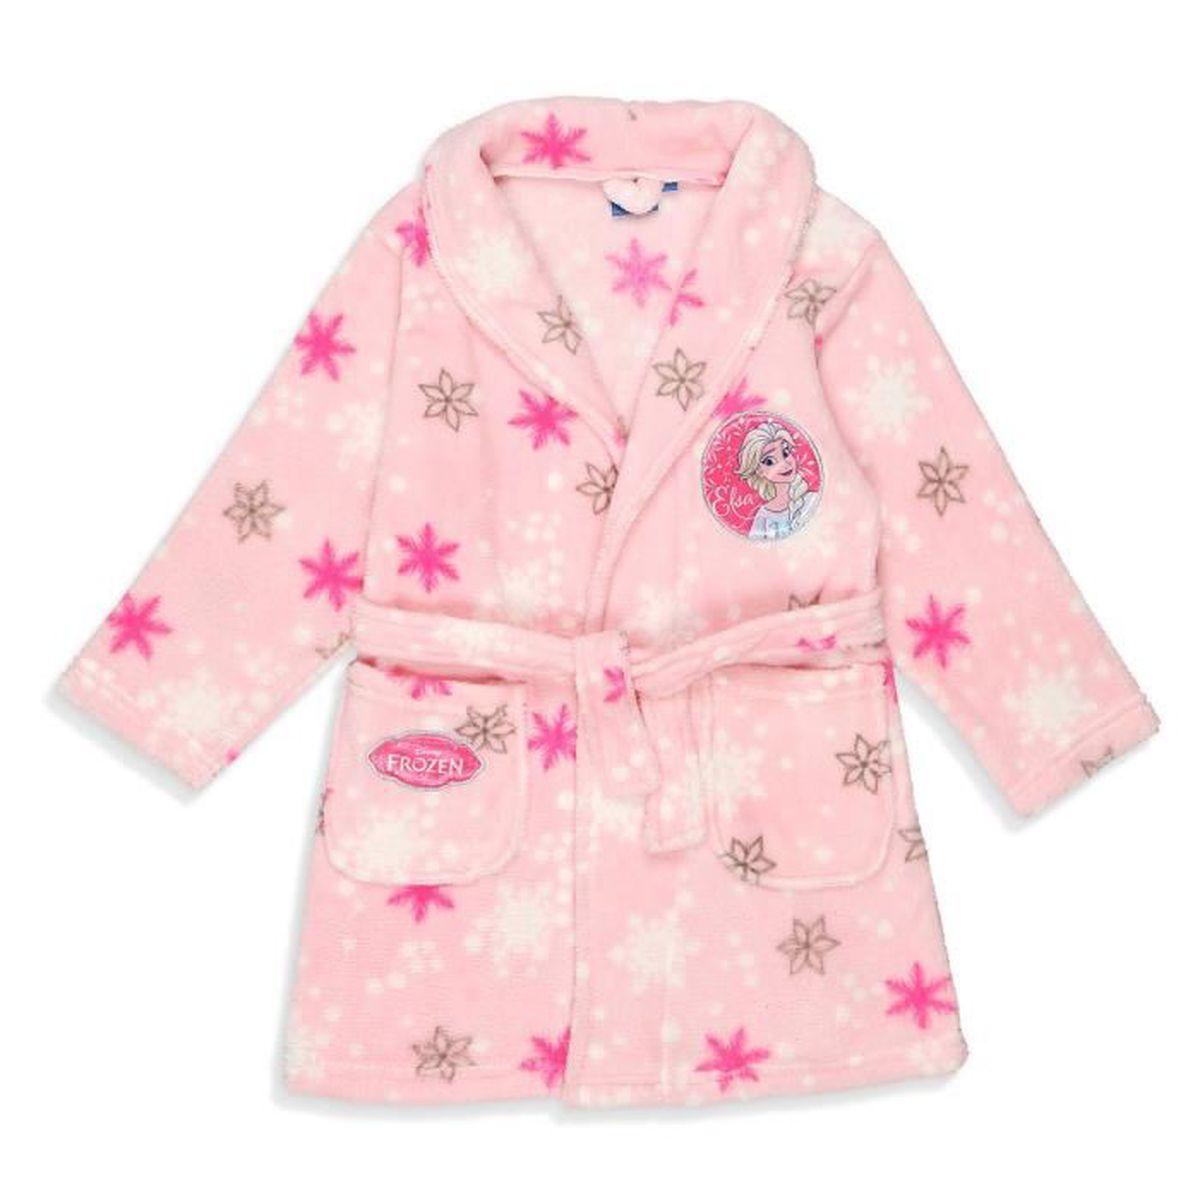 PYJAMA FROZEN Robe de Chambre Coral Fille 100% Polyester